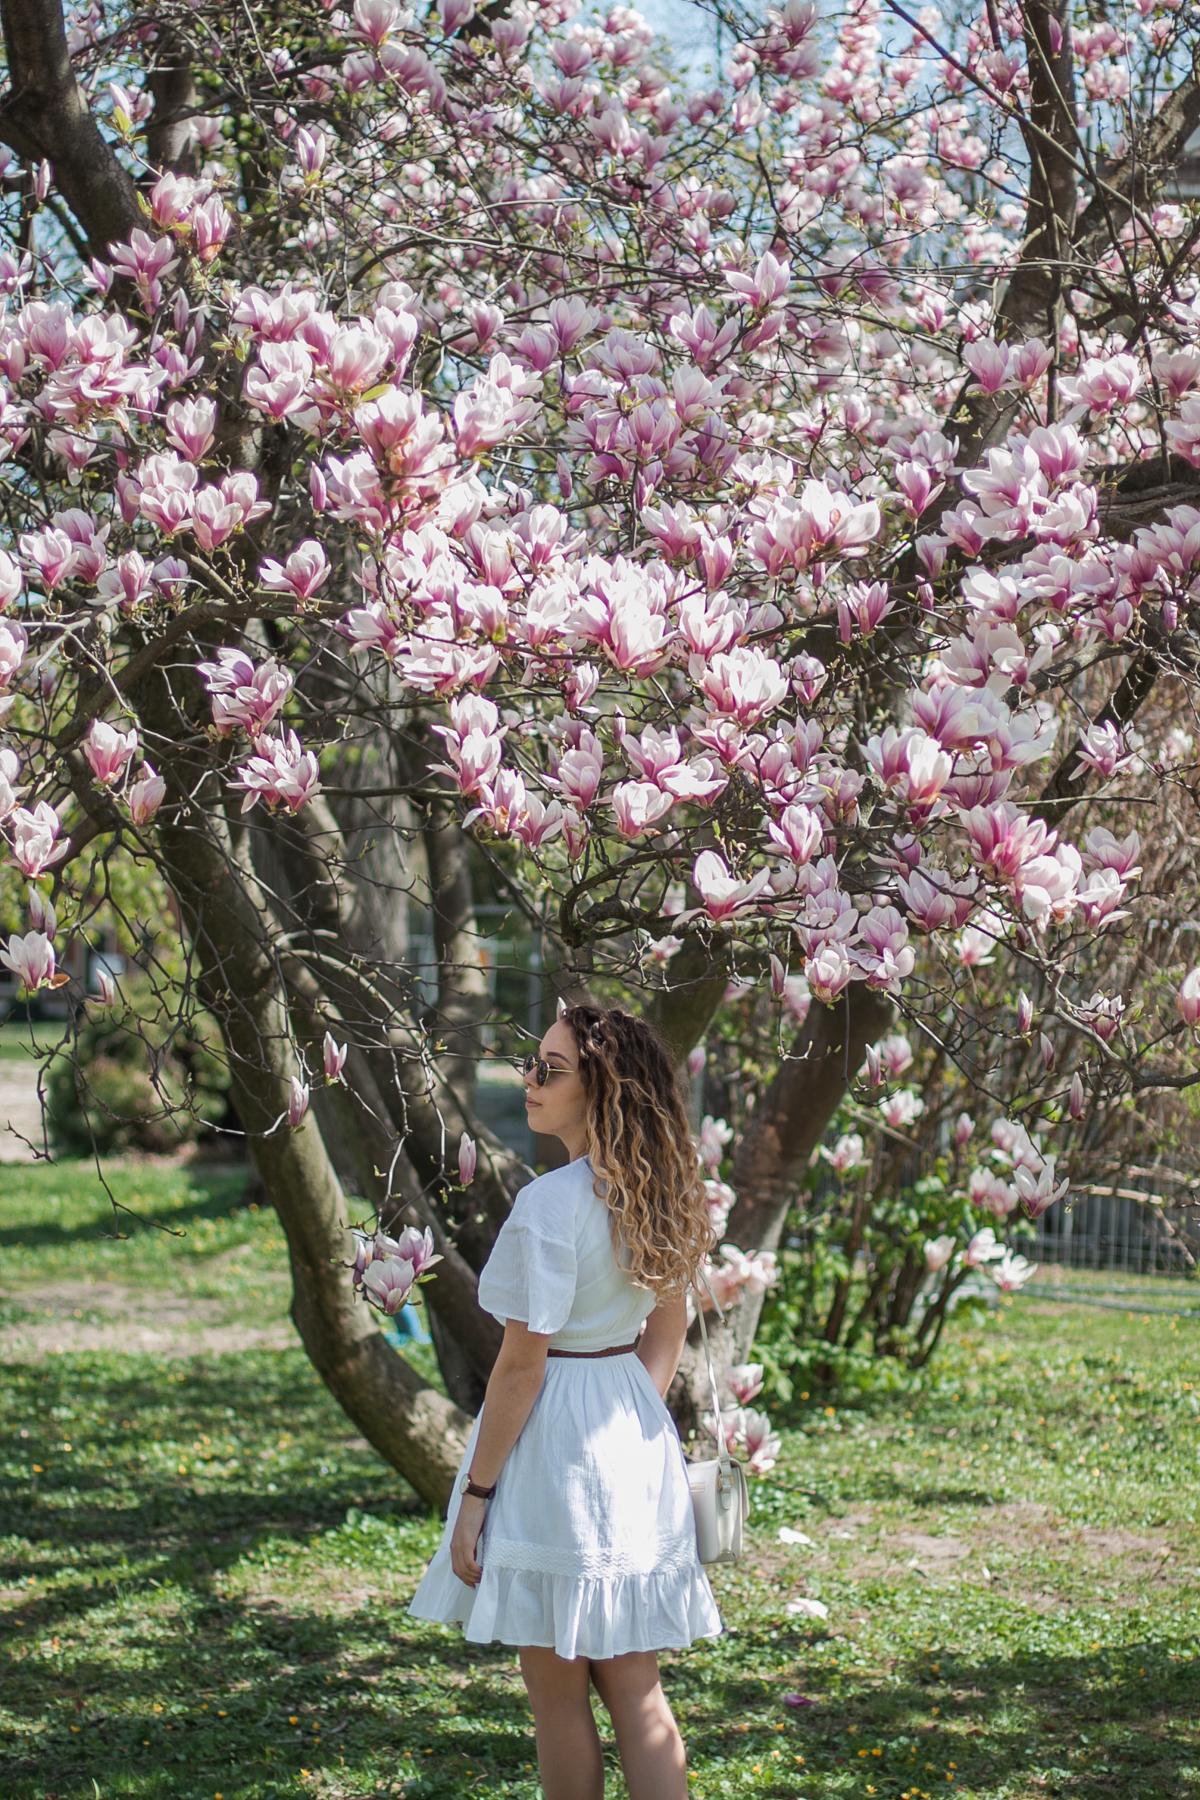 magnolie-%C5%82a%C5%84cut.jpg